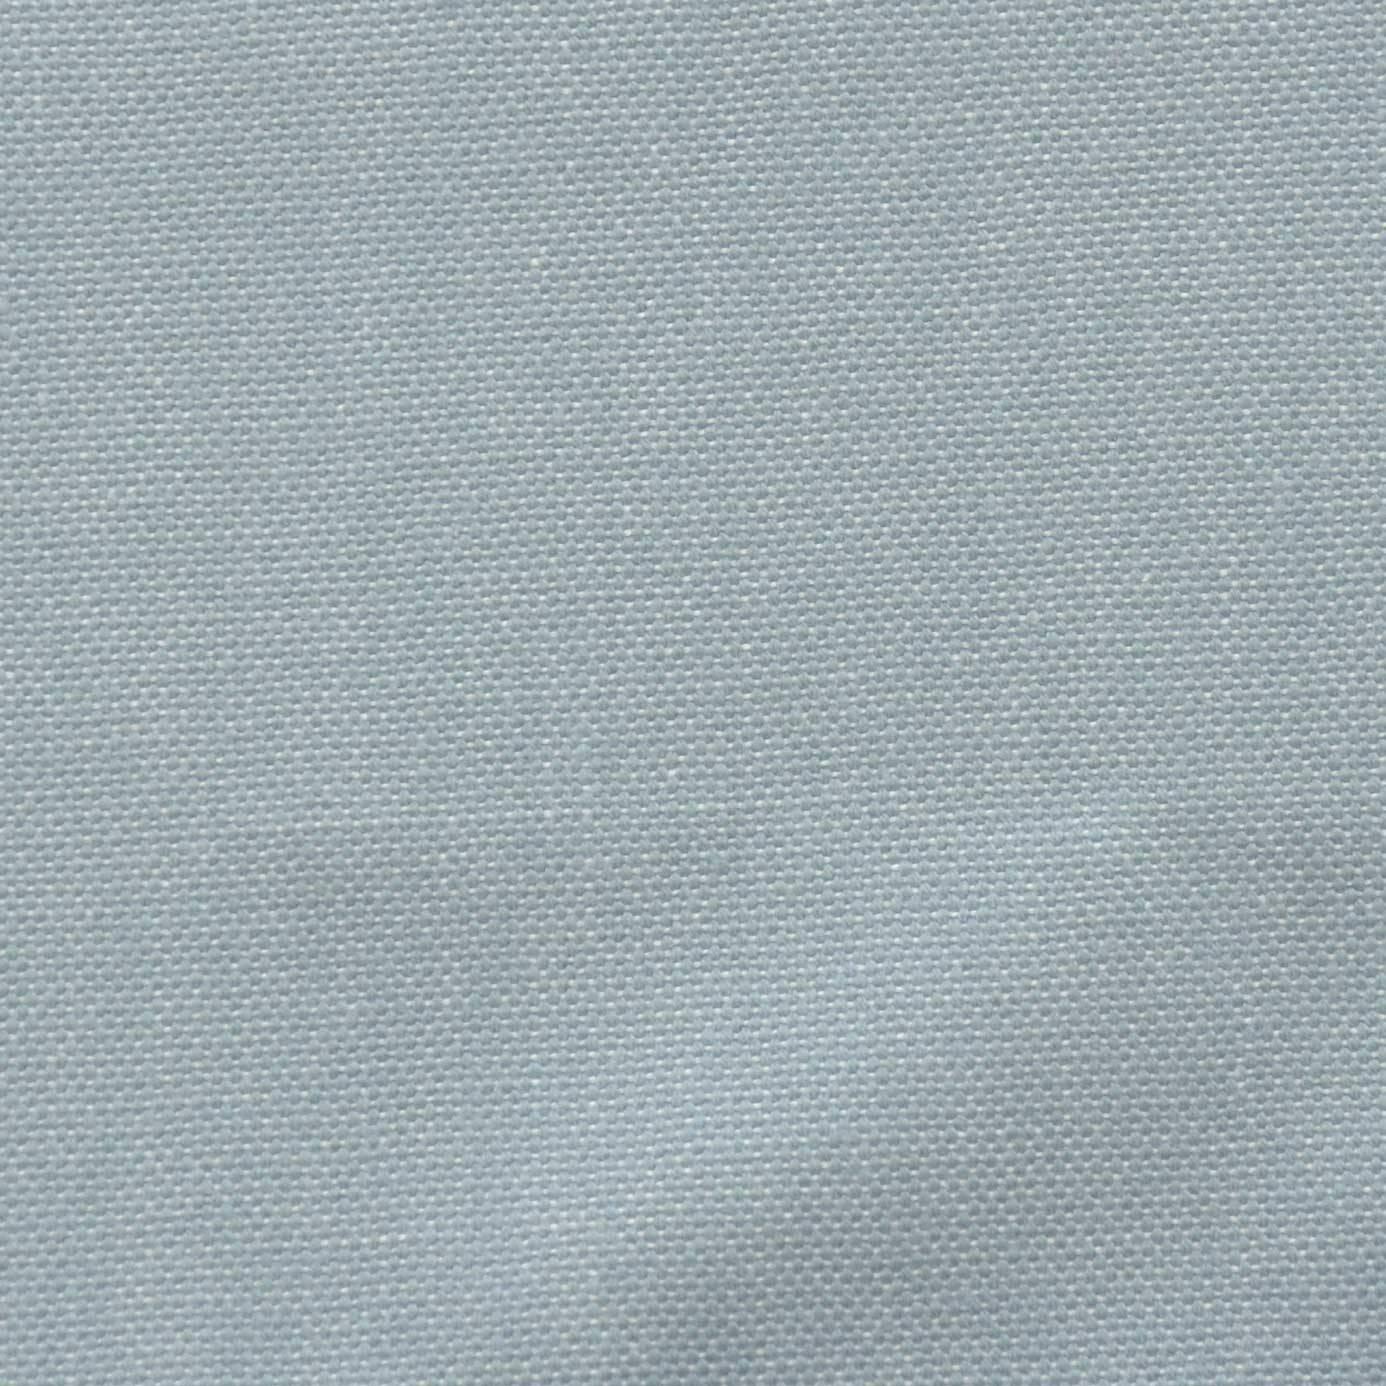 Fairfax fabric chambray f0502 03 clarke clarke new for Chambray fabric